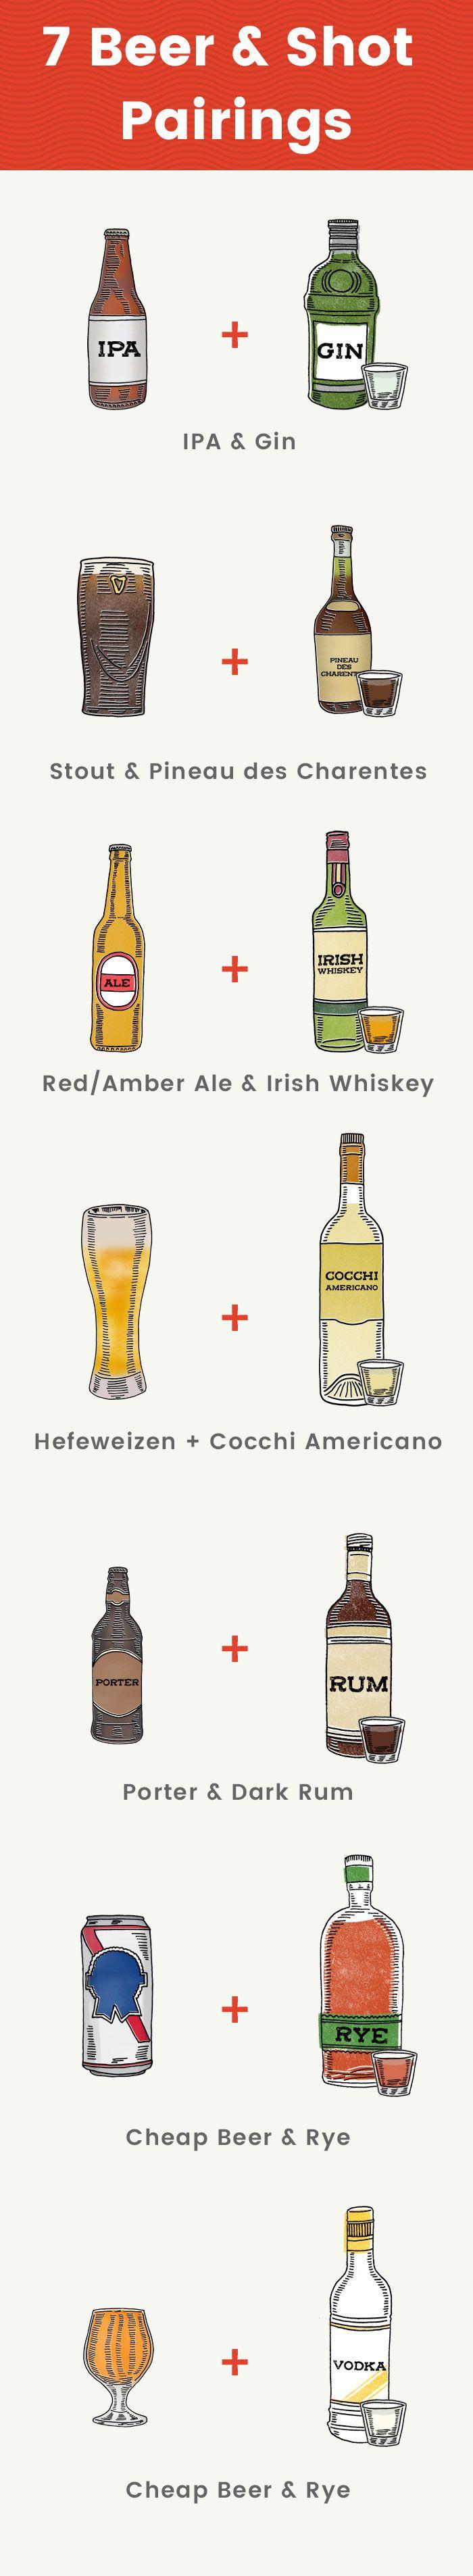 best 25 can of beer ideas on pinterest light beer ingredients